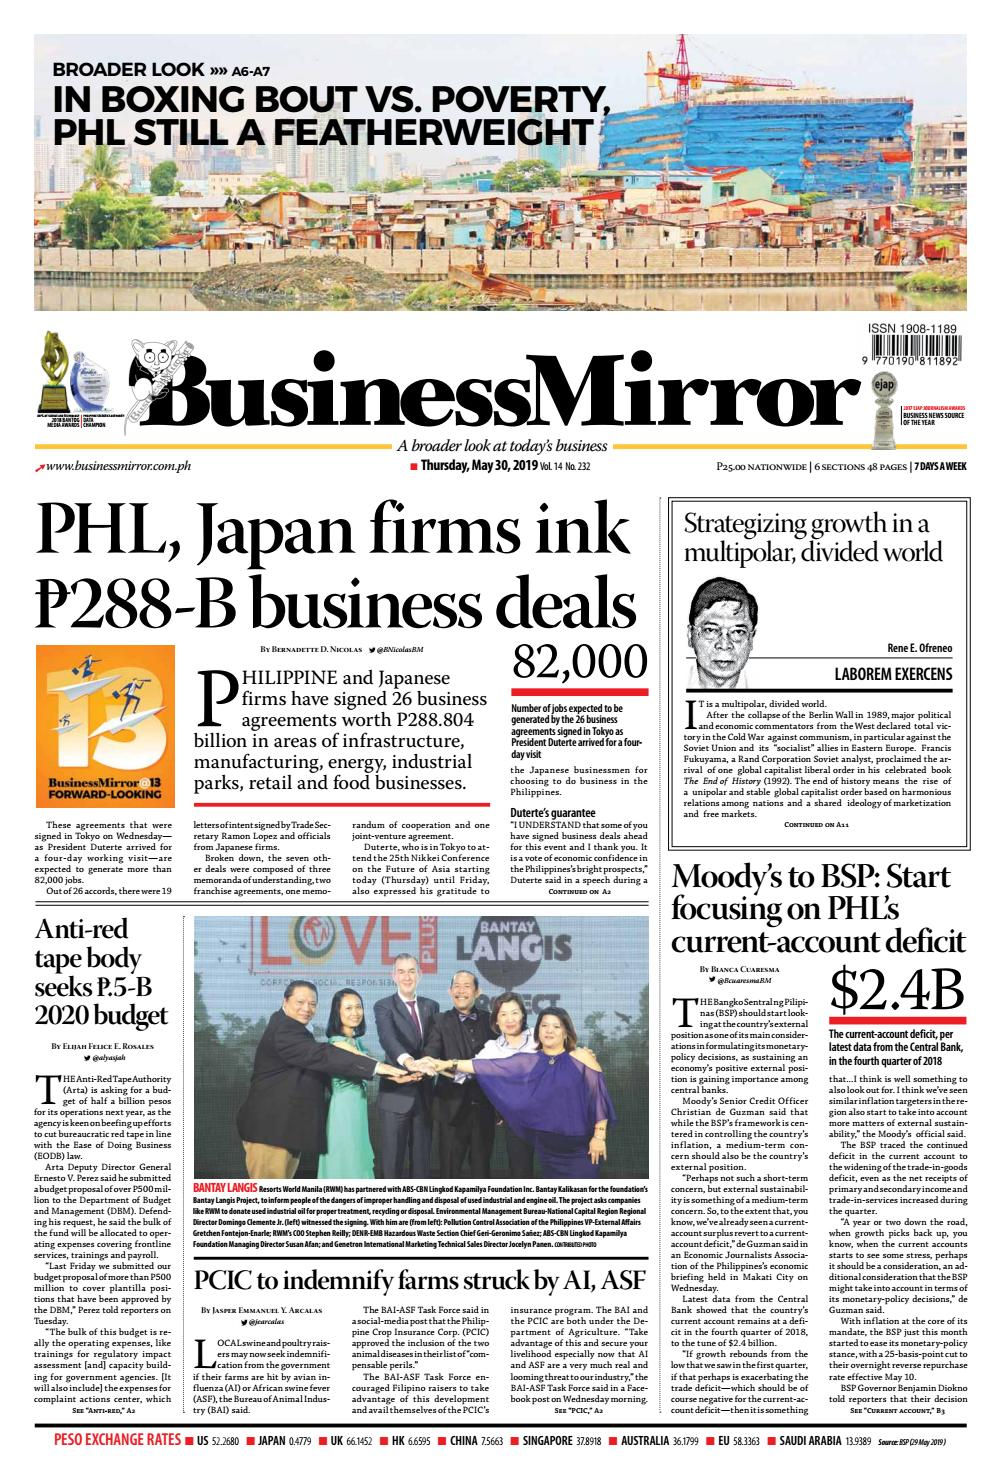 BusinessMirror May 30, 2019 by BusinessMirror - issuu